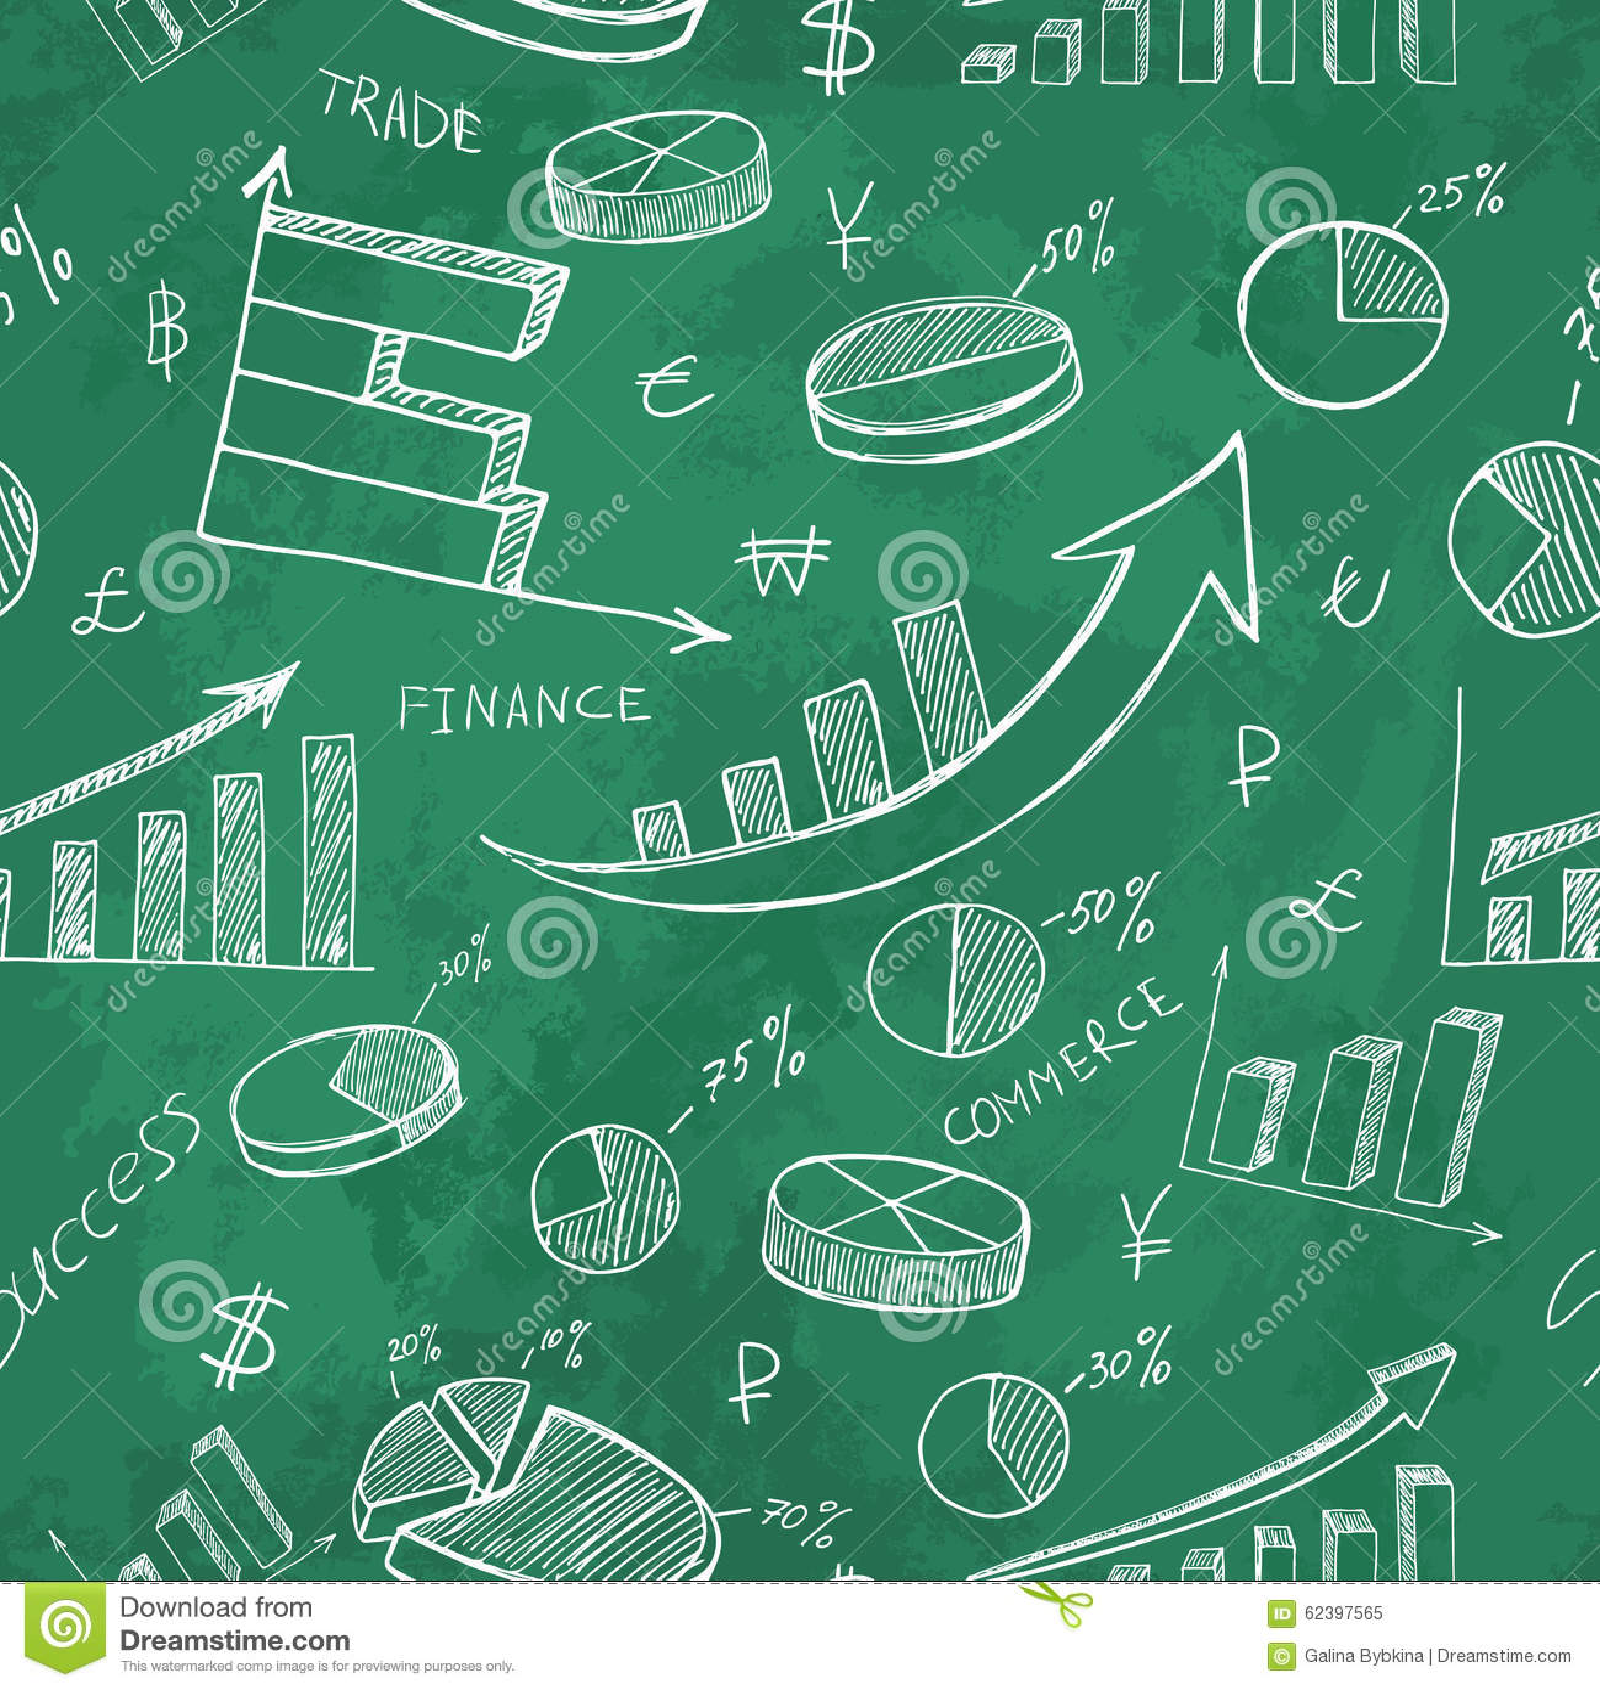 Finance Background: Hand Drawn Business Infographics Finance Seamless Pattern